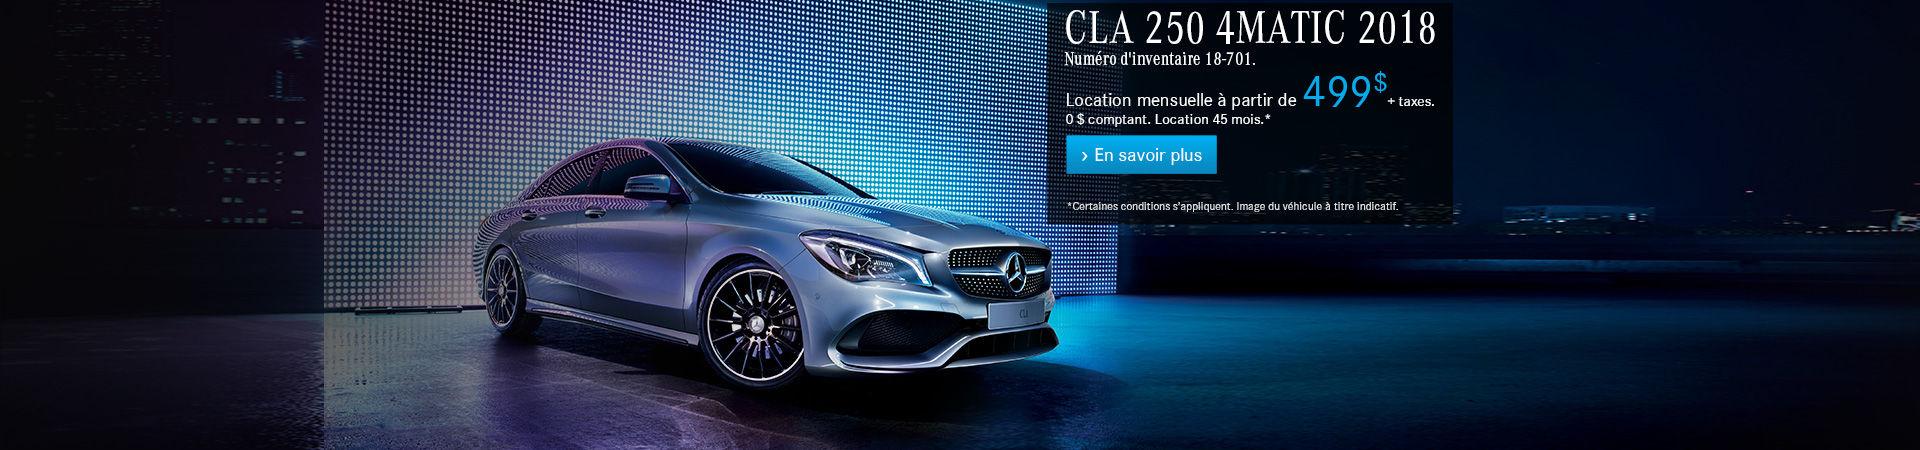 CLA 250 4MATIC 2018